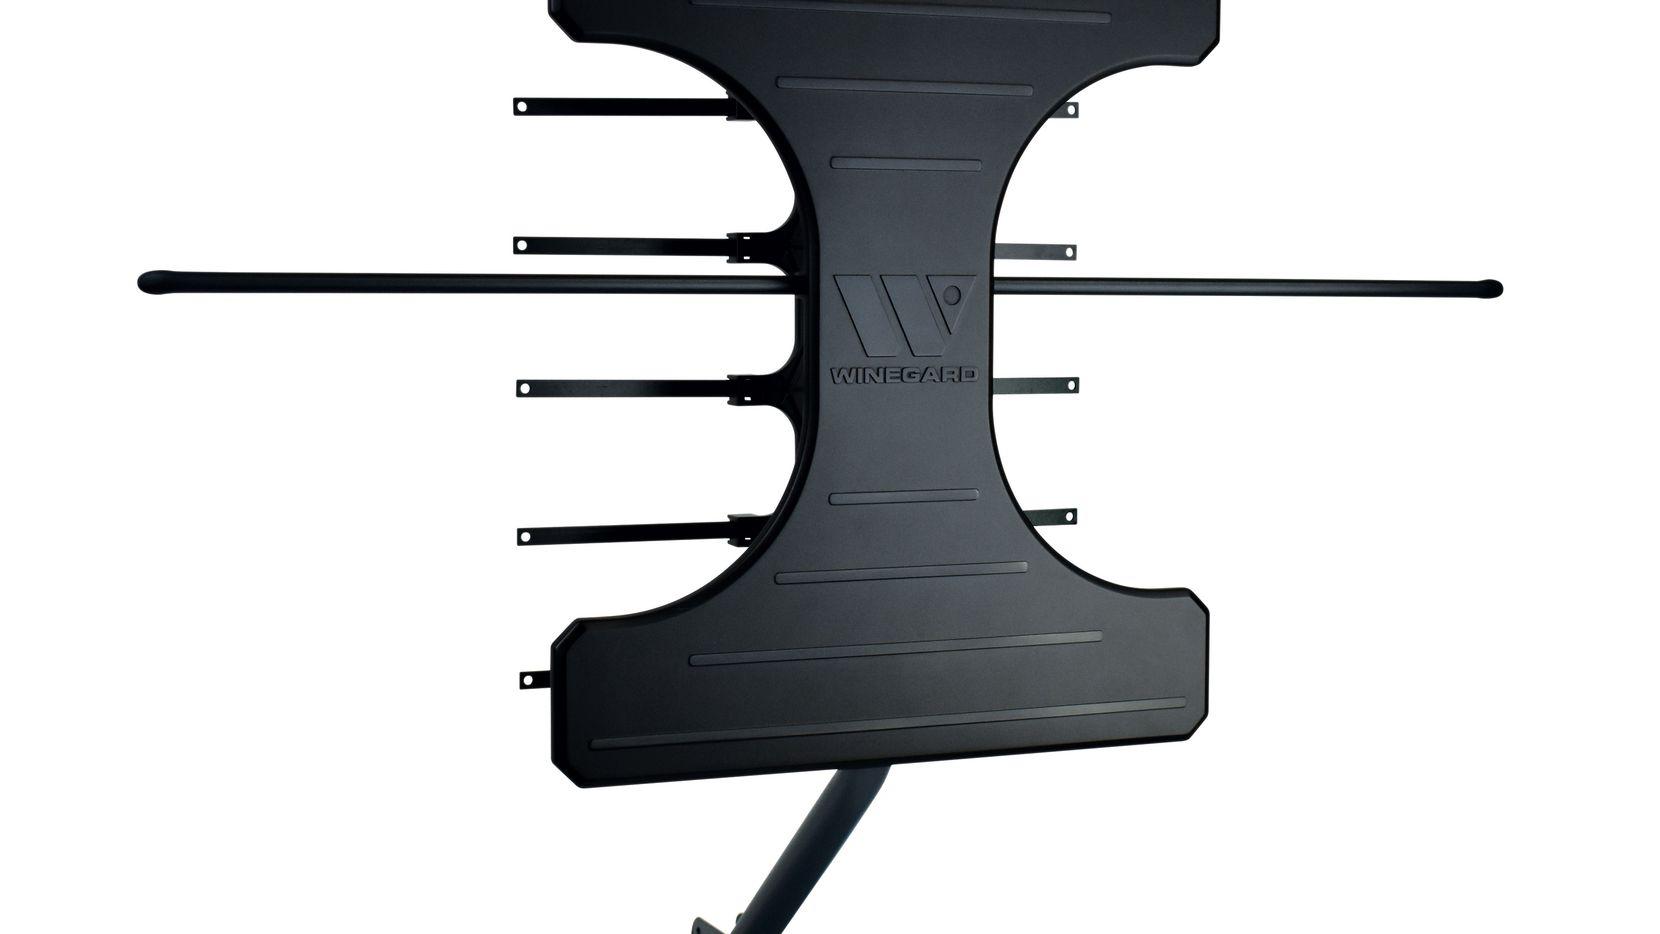 The Winegard Elite 7550 Long Range VHF/UHF Outdoor HDTV Antenna